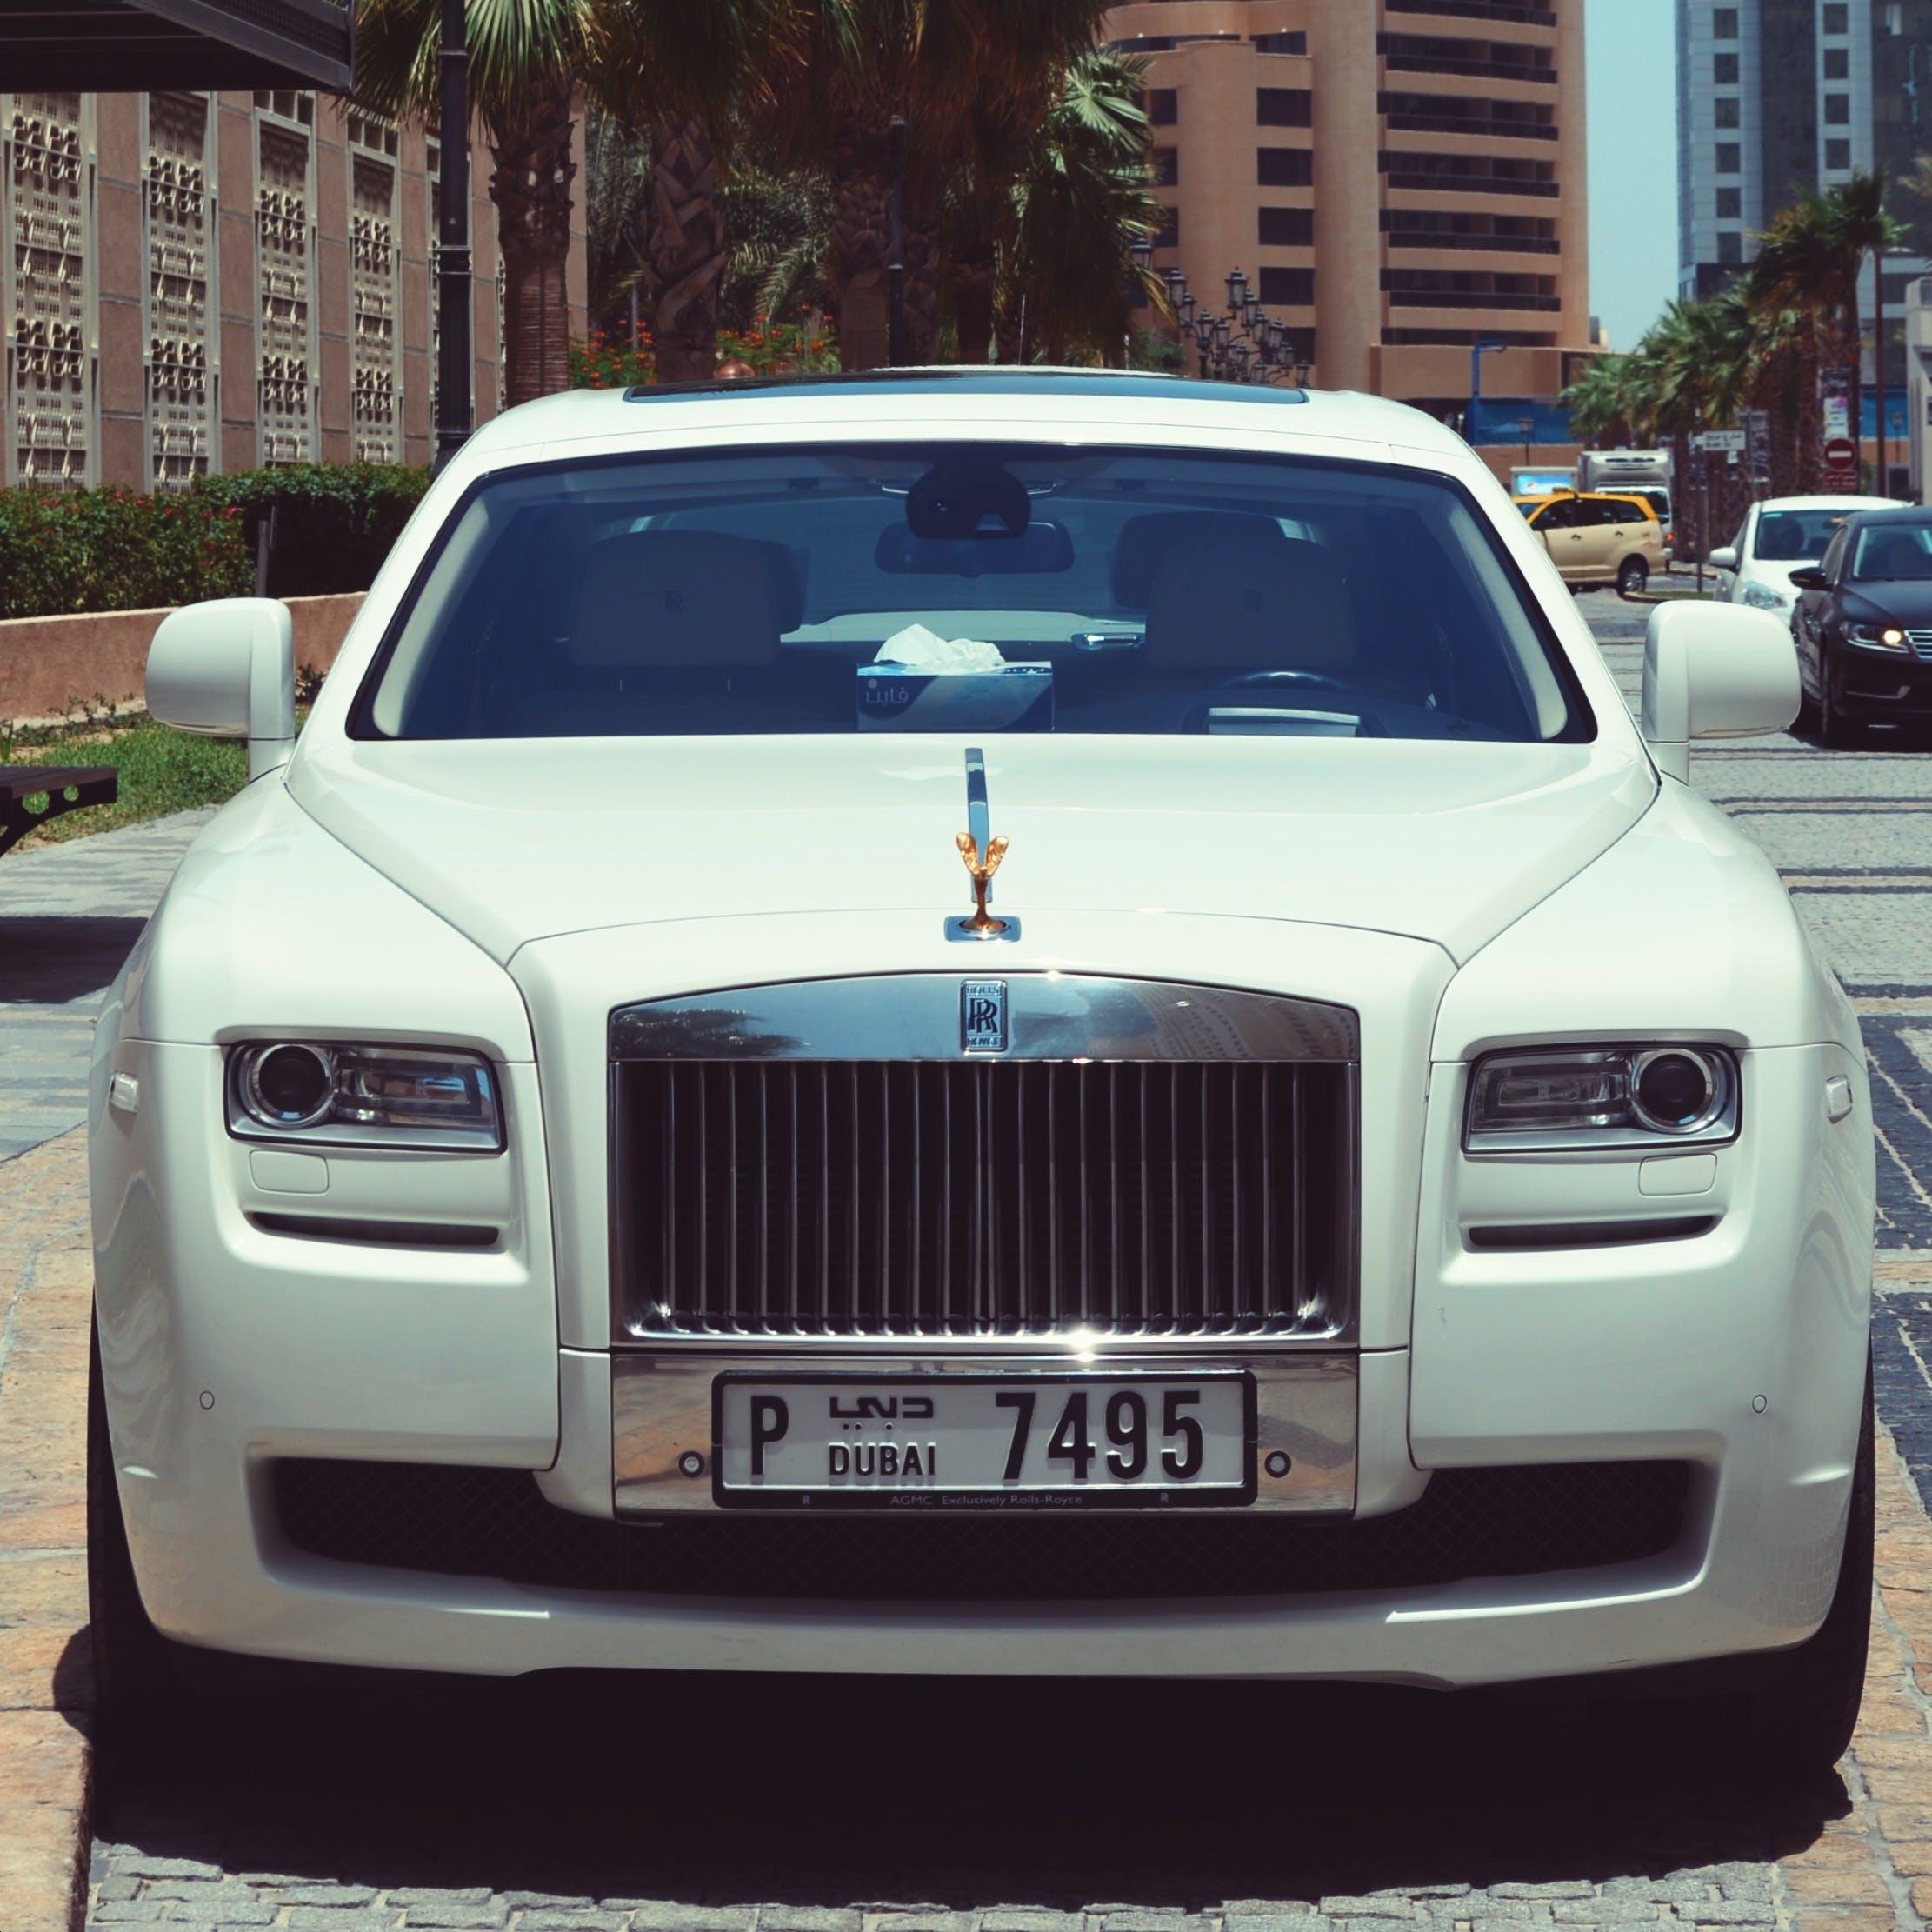 Free stock photo of car, luxury, Rolls Royce, luxury car